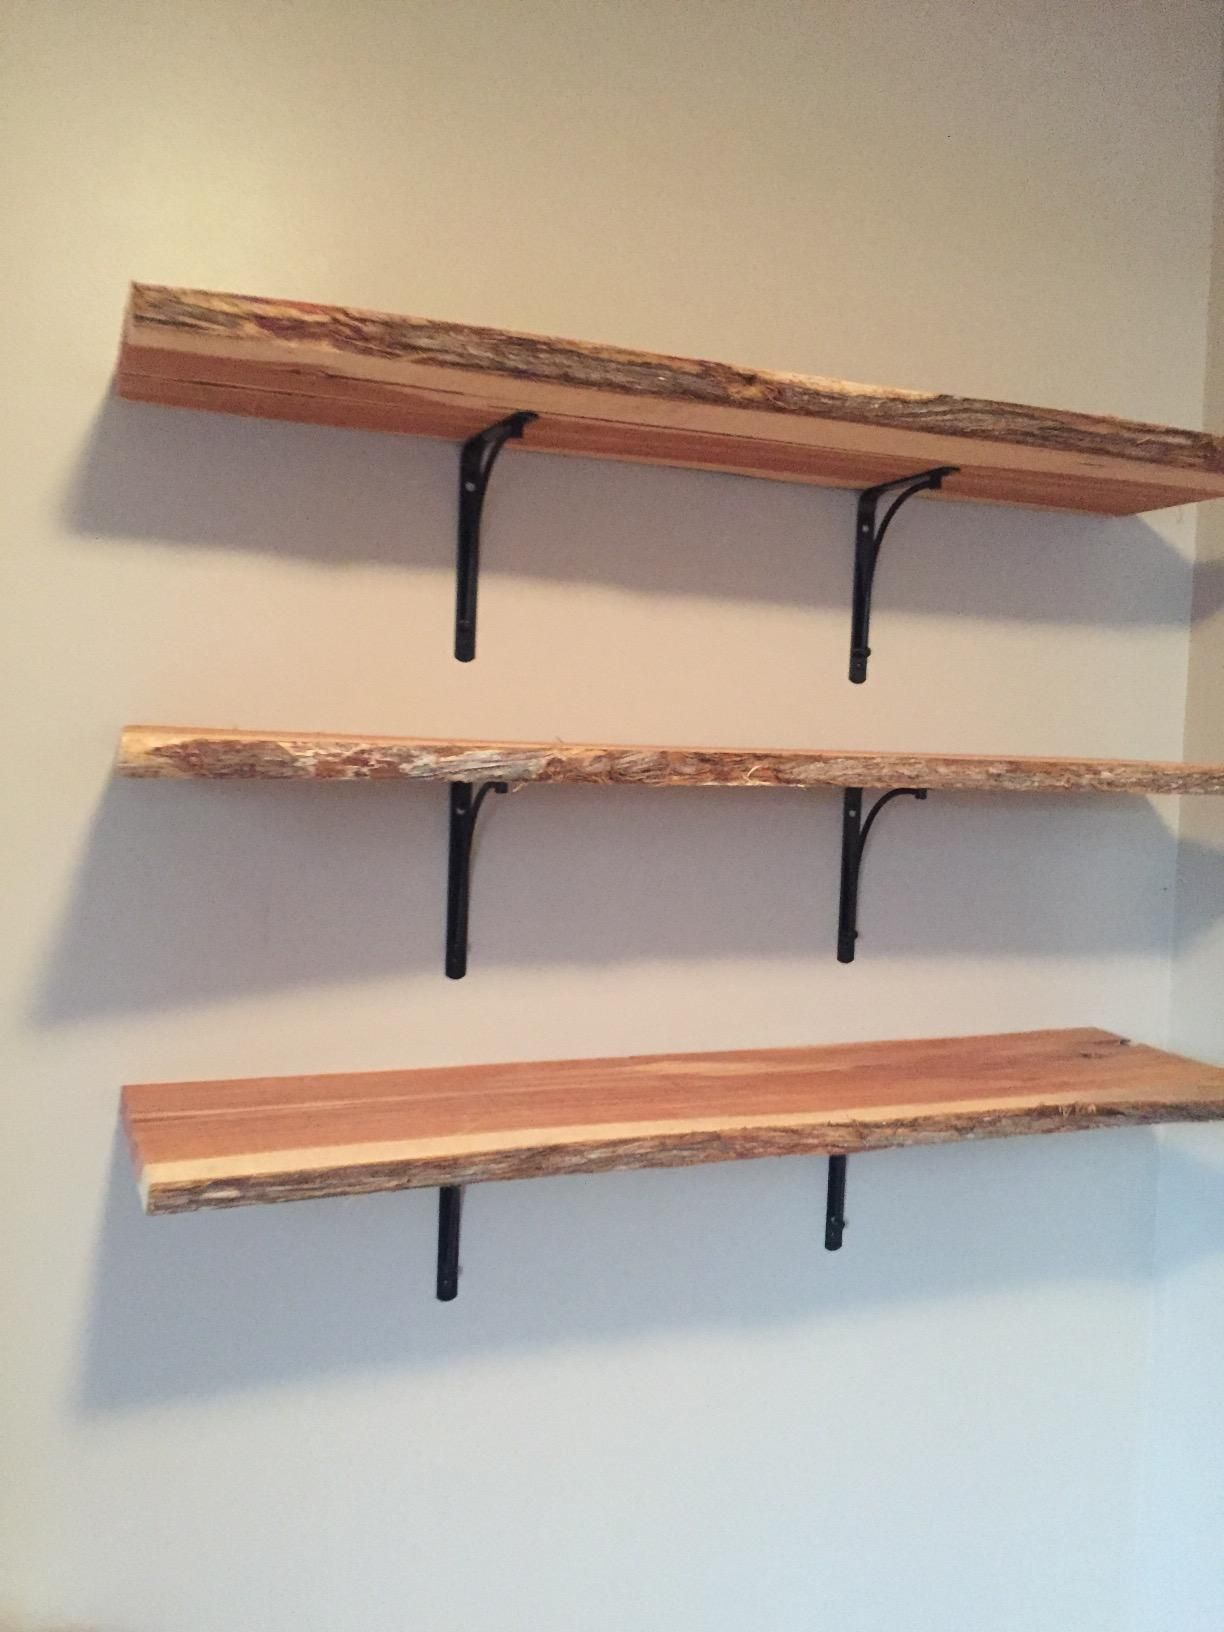 rubbermaid decorative shelf bracket 6 by 8